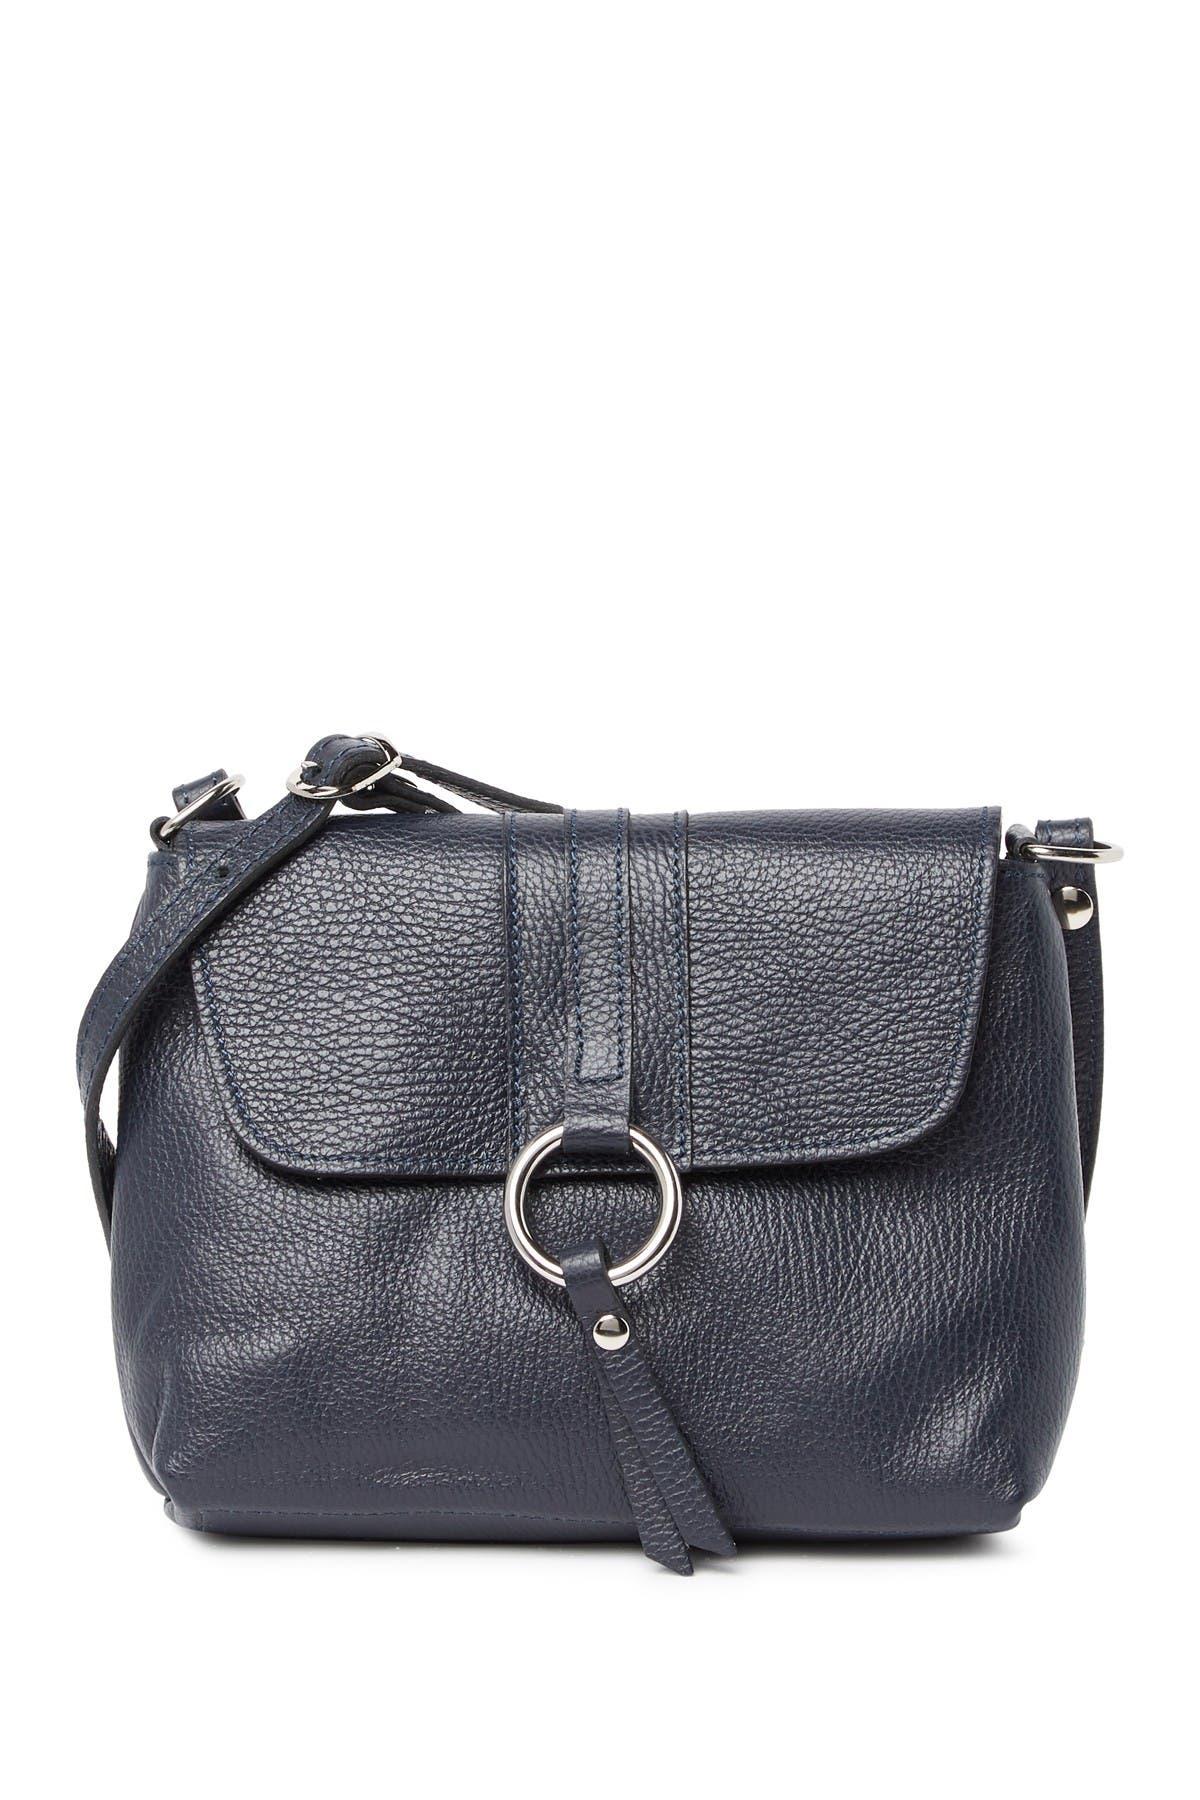 Image of Anna Luchini Leather Crossbody Bag